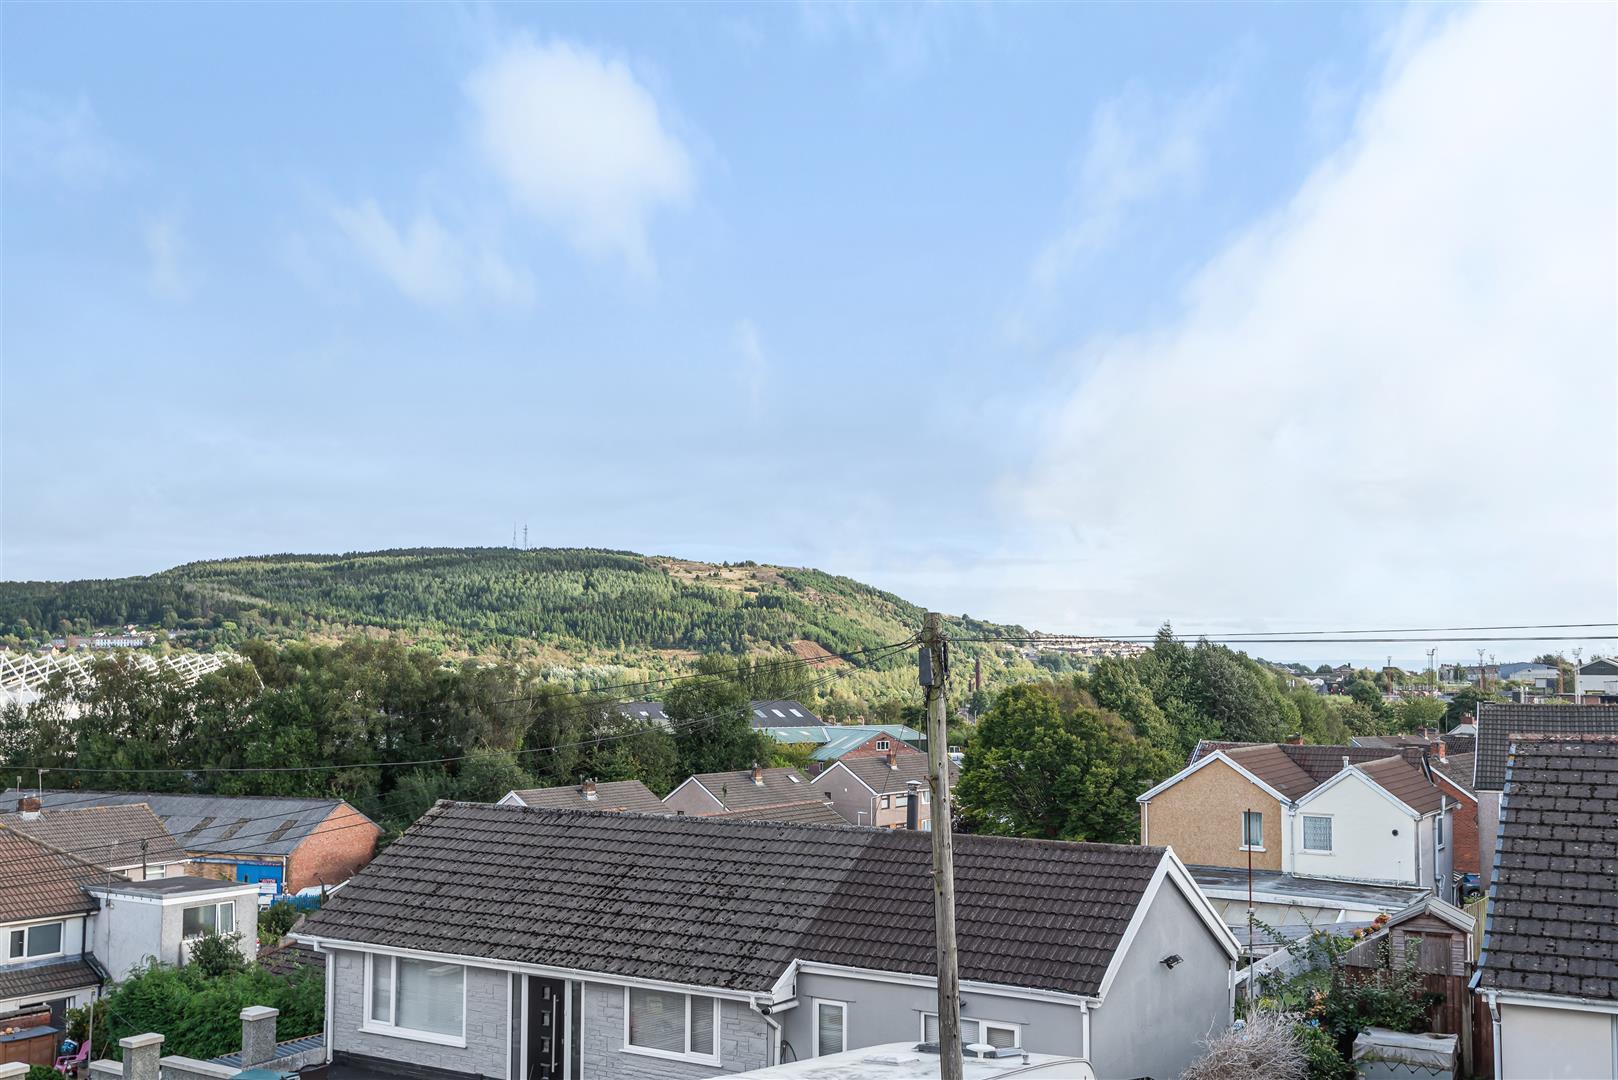 Pwll Street, Landore, Swansea, SA1 2PB